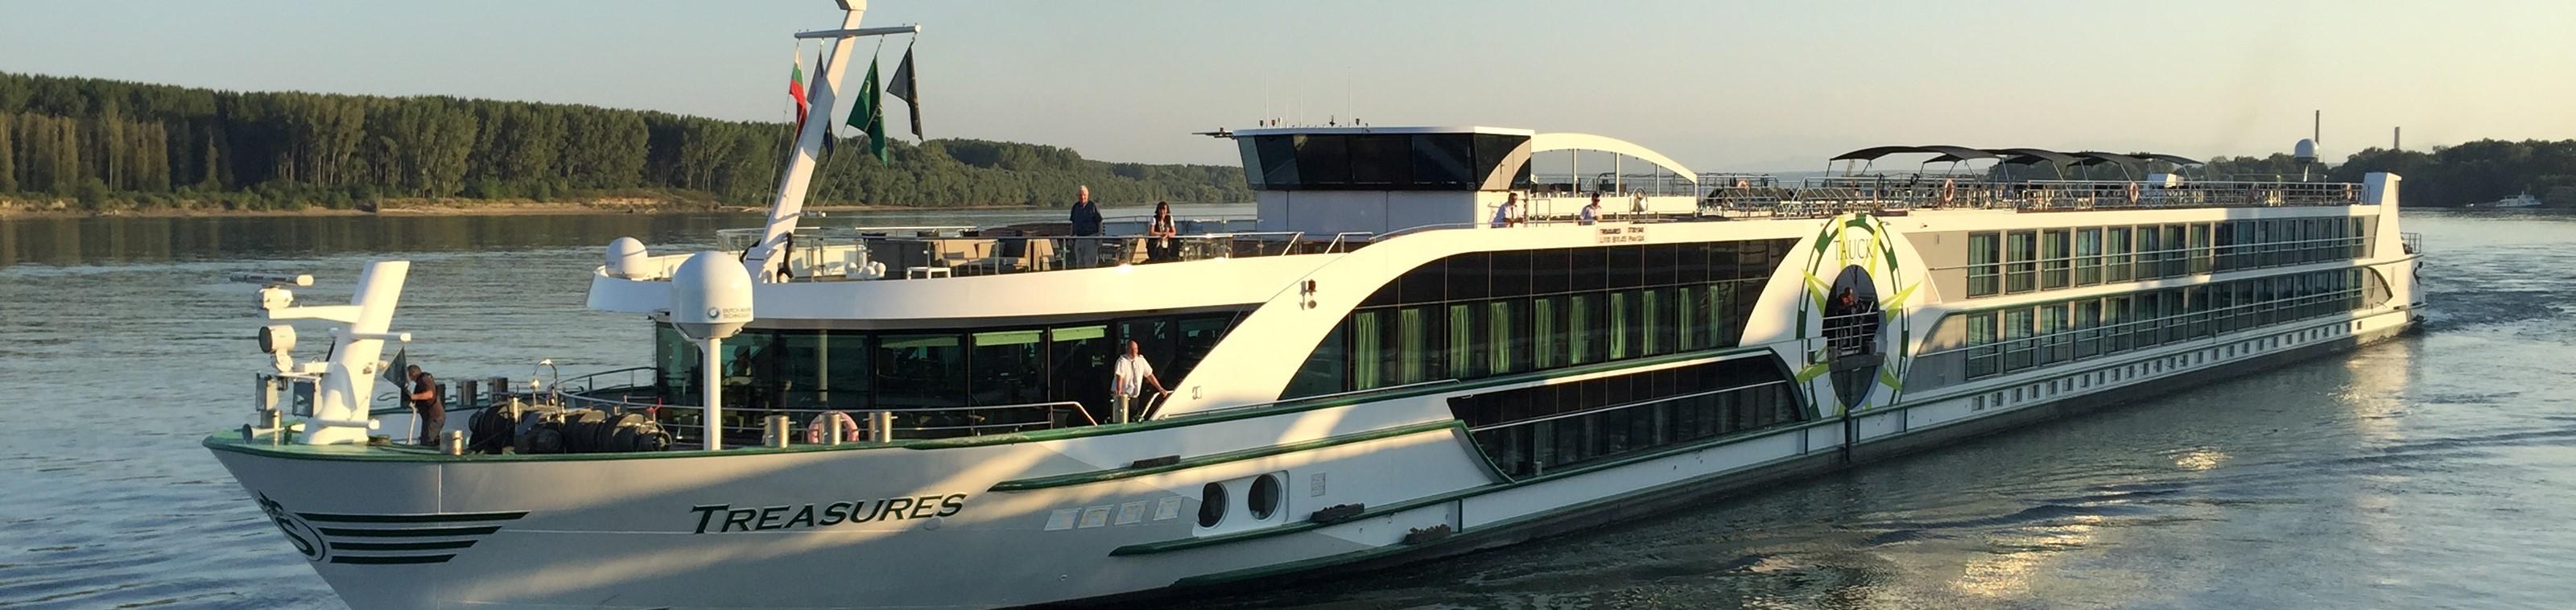 Riviercruise op de Main of de Rijn